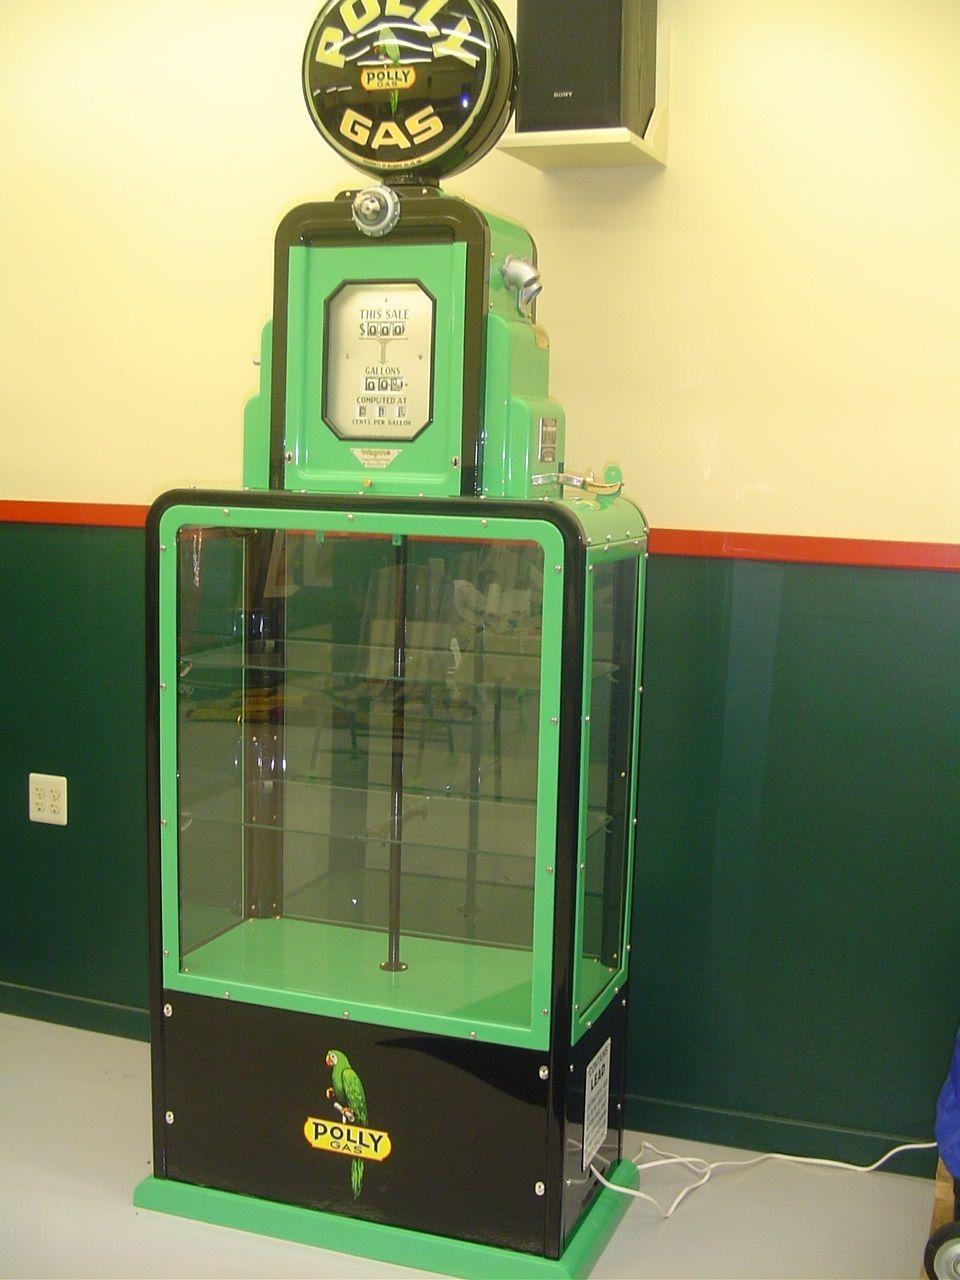 Rare Polly Showcase Gas Pump I restored Vintage gas